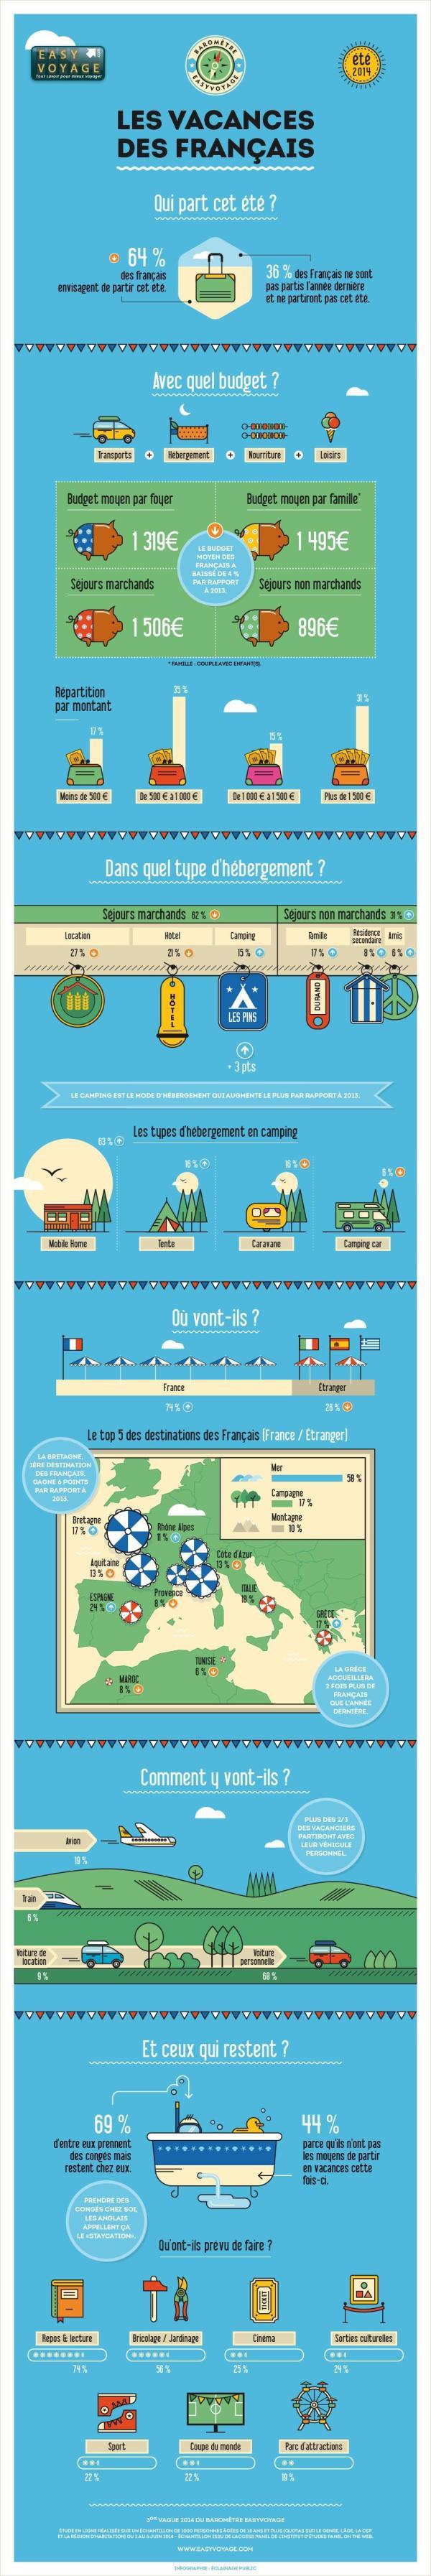 Infographie Easyvoyage - Profil type du vacancier en 2014 -